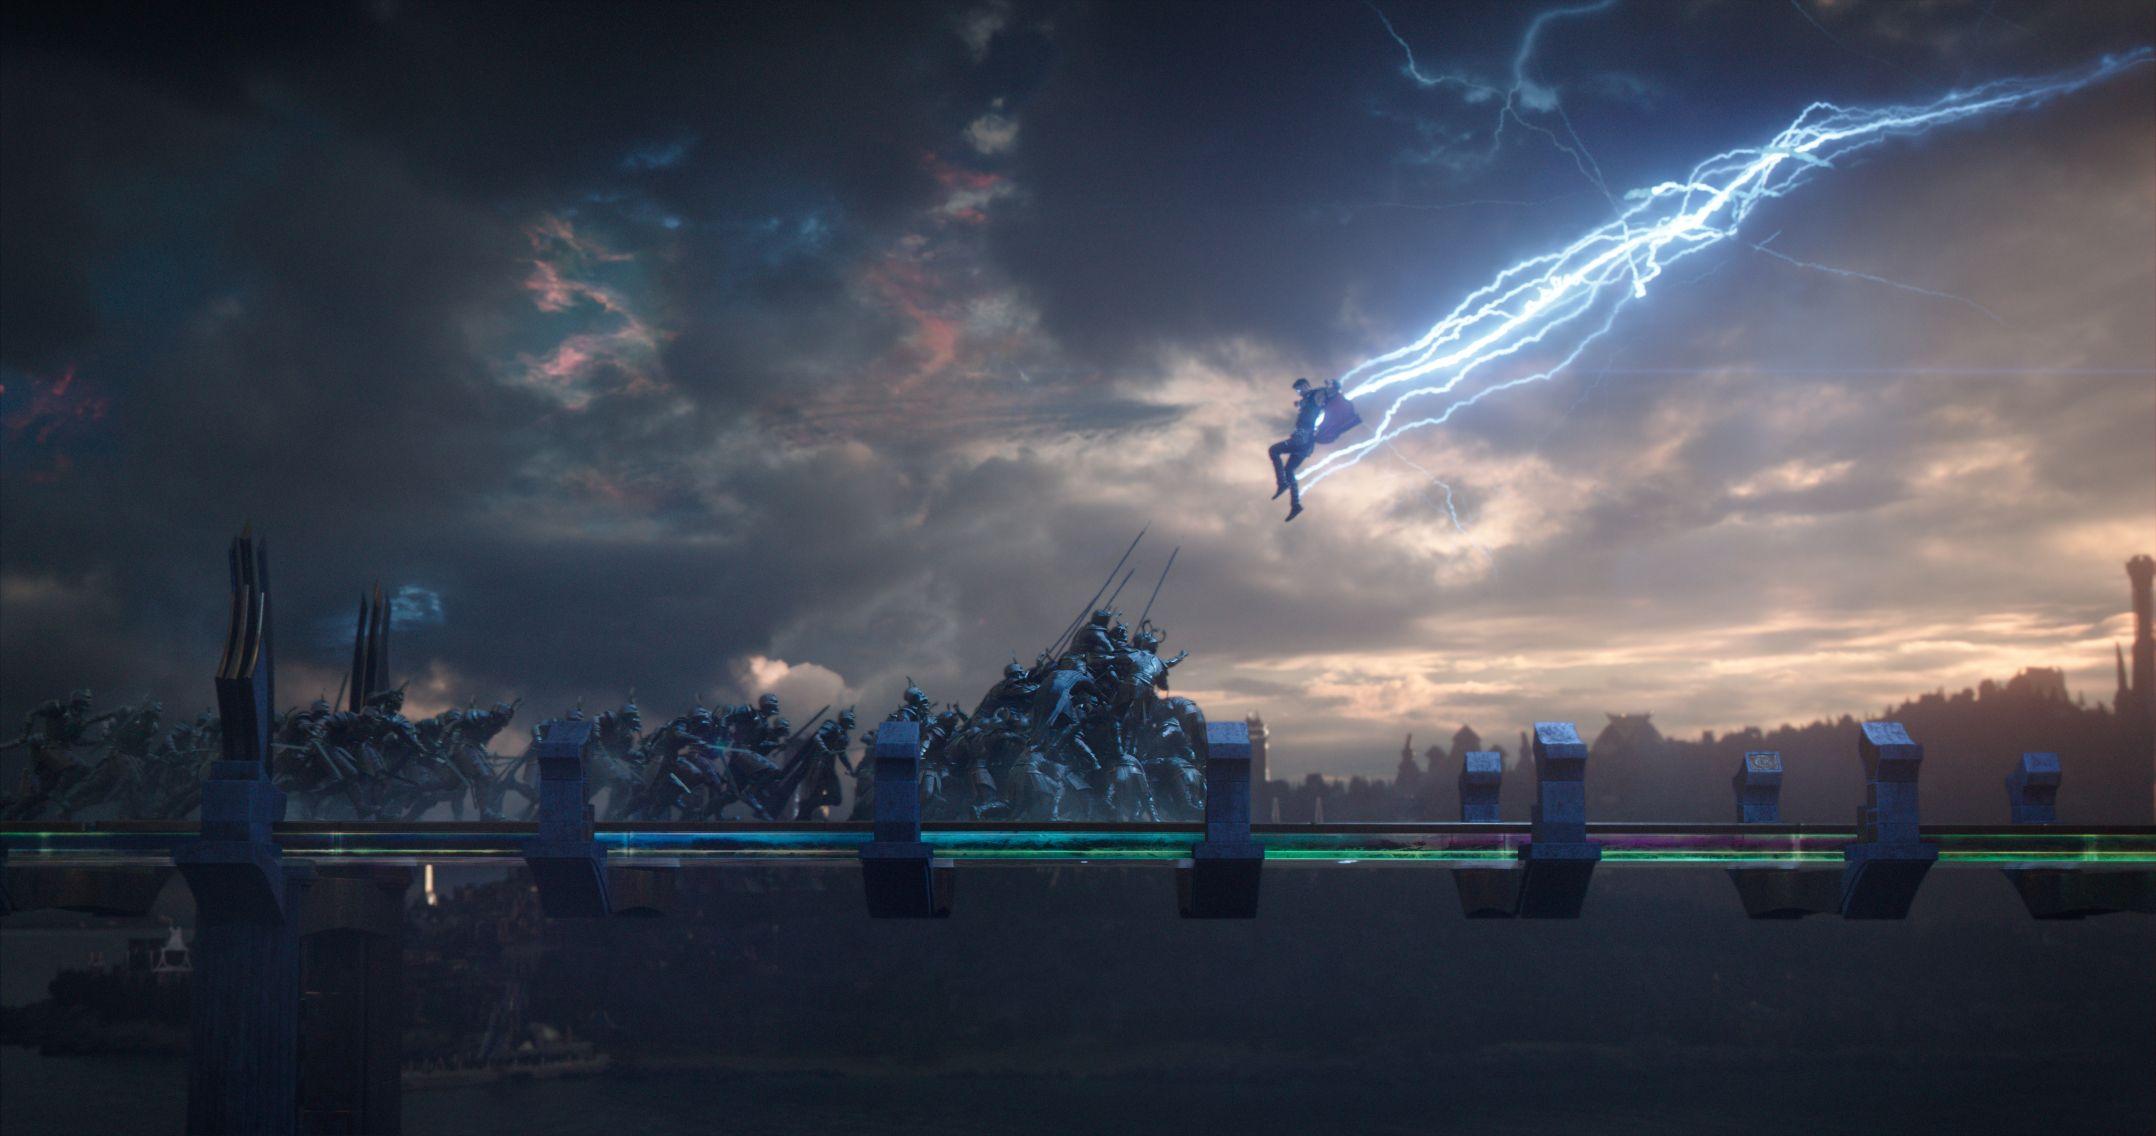 3.) Thor: Ragnarok